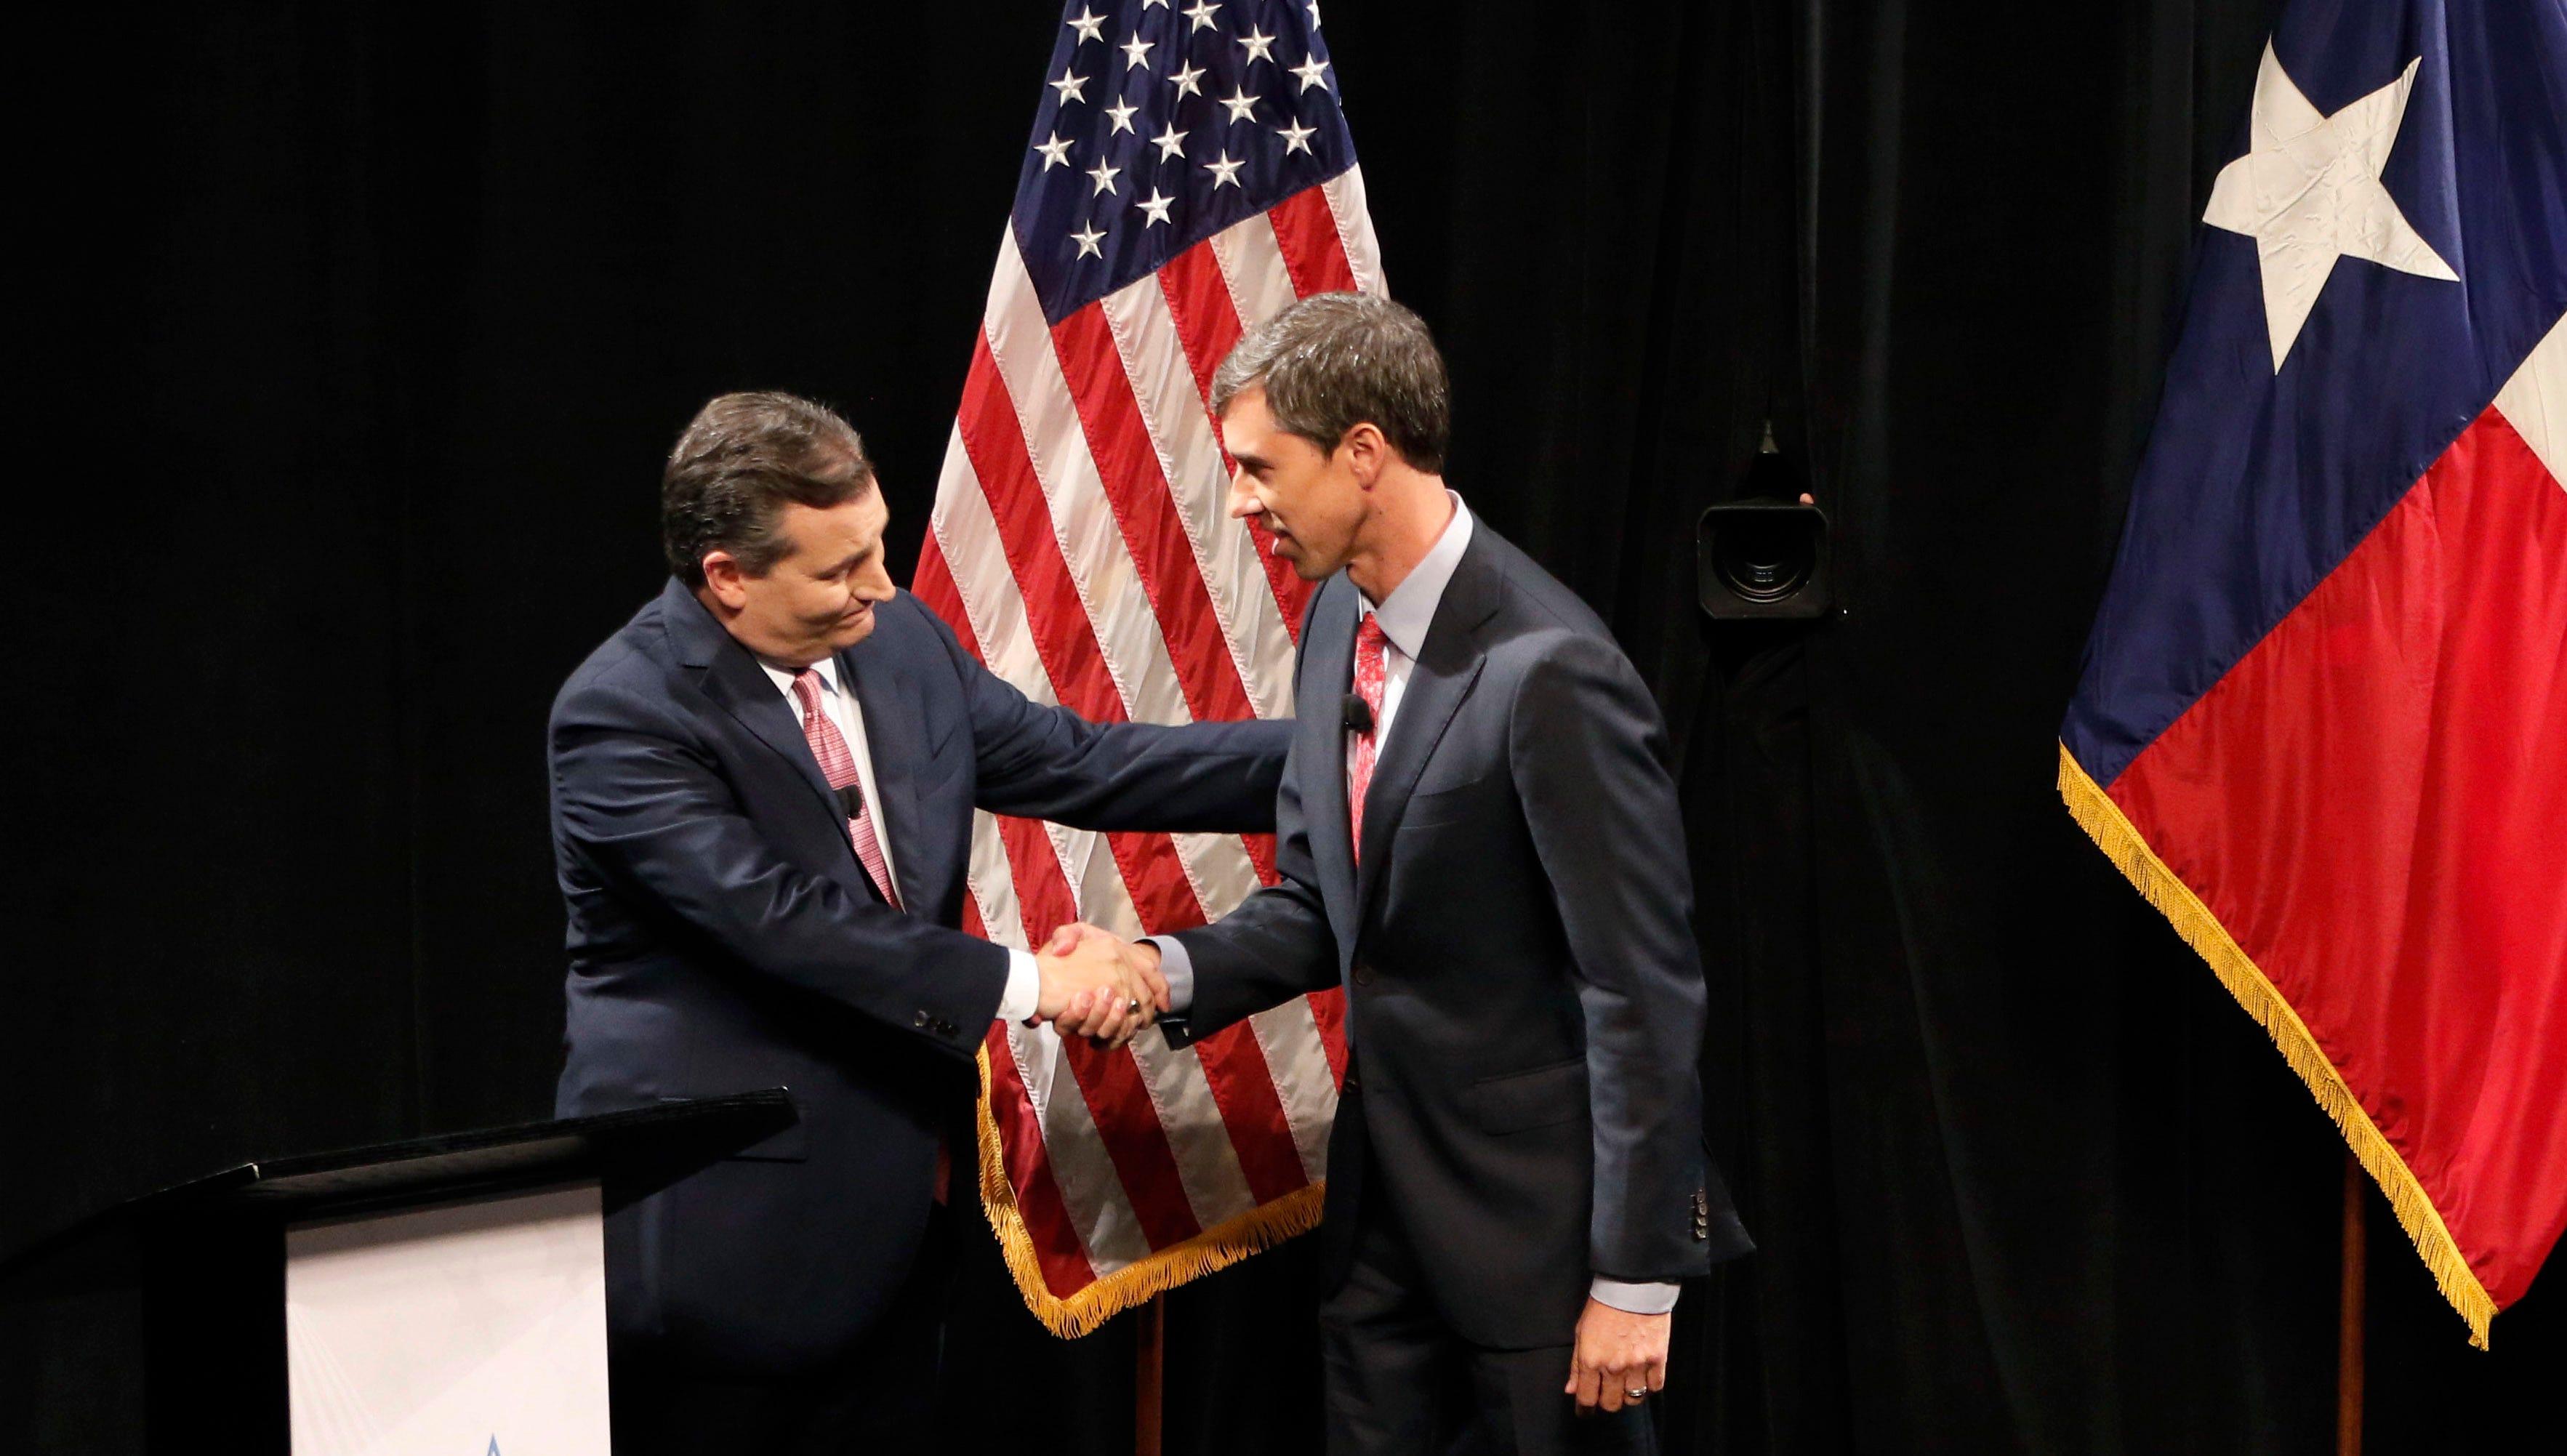 Republican U.S. Senator Ted Cruz, left, and Democratic U.S. Representative Beto O'Rourke, right, shake hands following their first debate for the Texas U.S. Senate in Dallas, Friday, Sept. 21, 2018. (Nathan Hunsinger/The Dallas Morning News via AP, Pool)